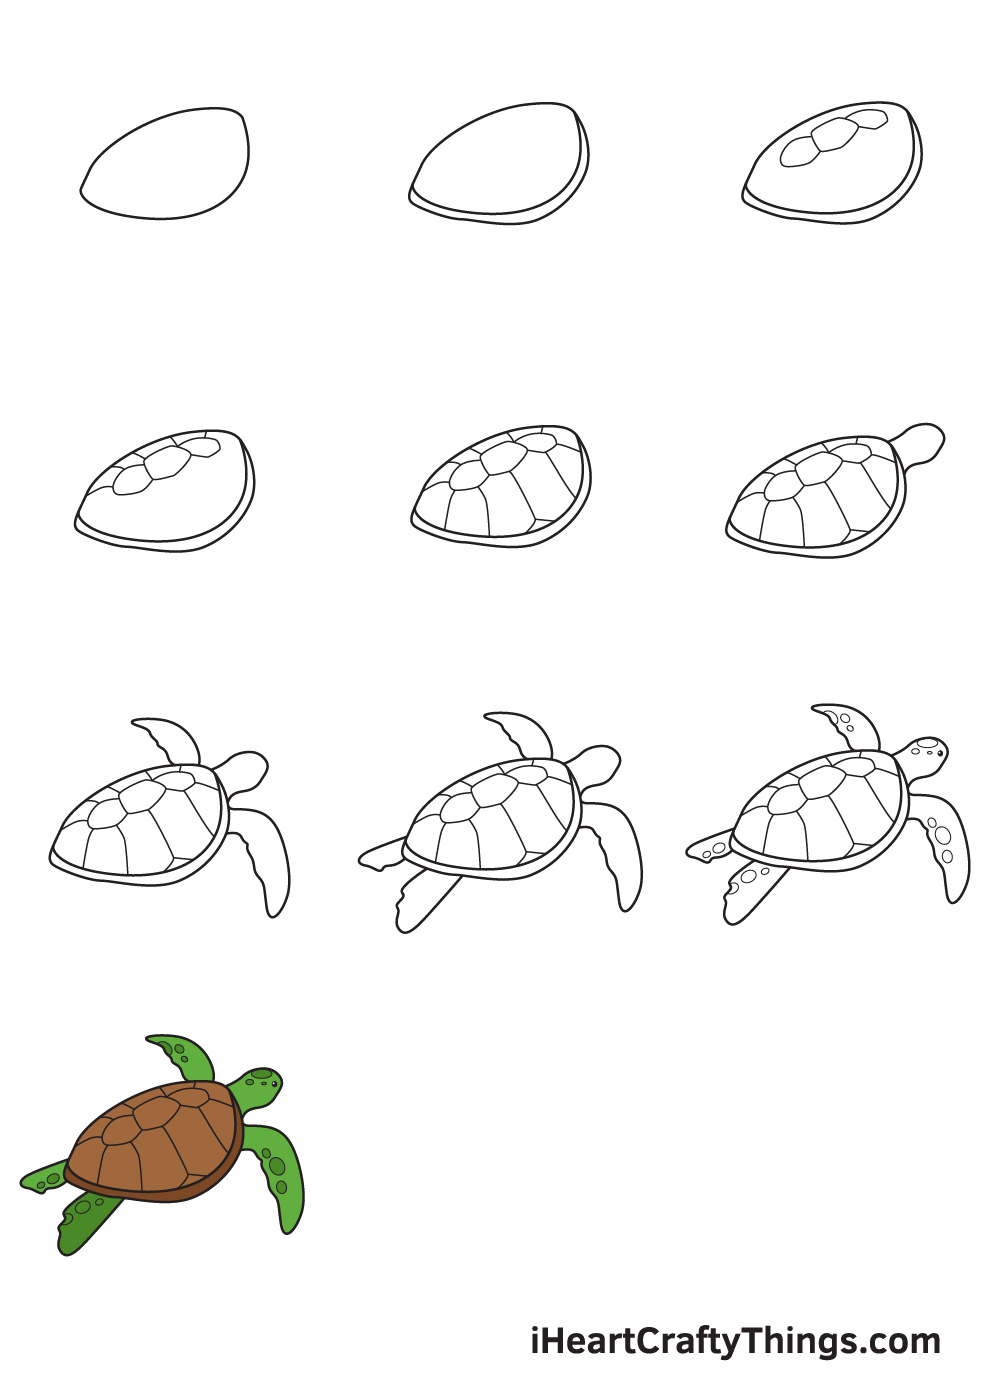 Drawing Sea Turtle in 9 Easy Steps